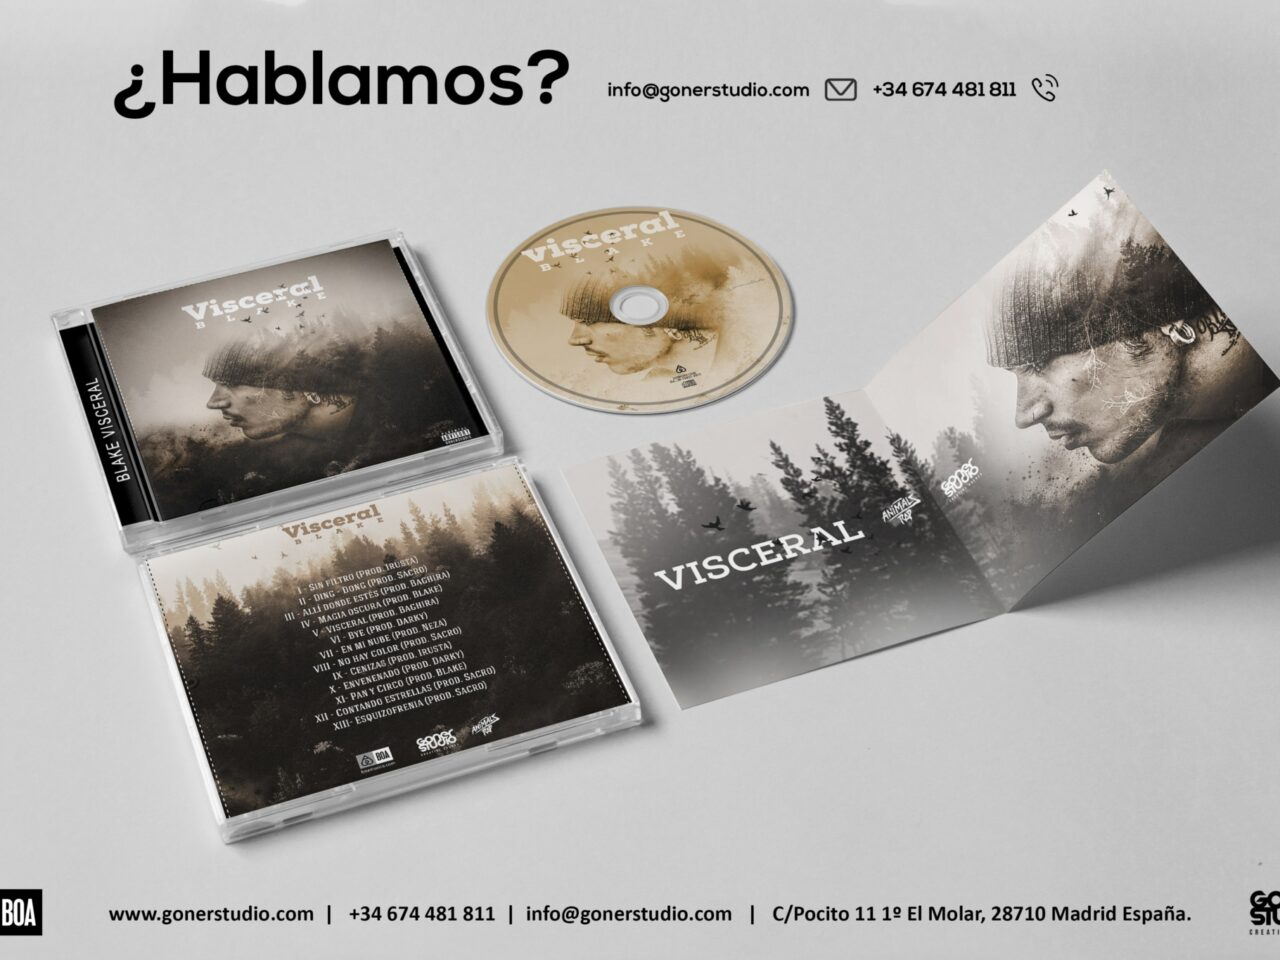 https://konektamusic.com/wp-content/uploads/2021/08/Montaje-Redes-Blake-scaled-1-1280x960.jpg